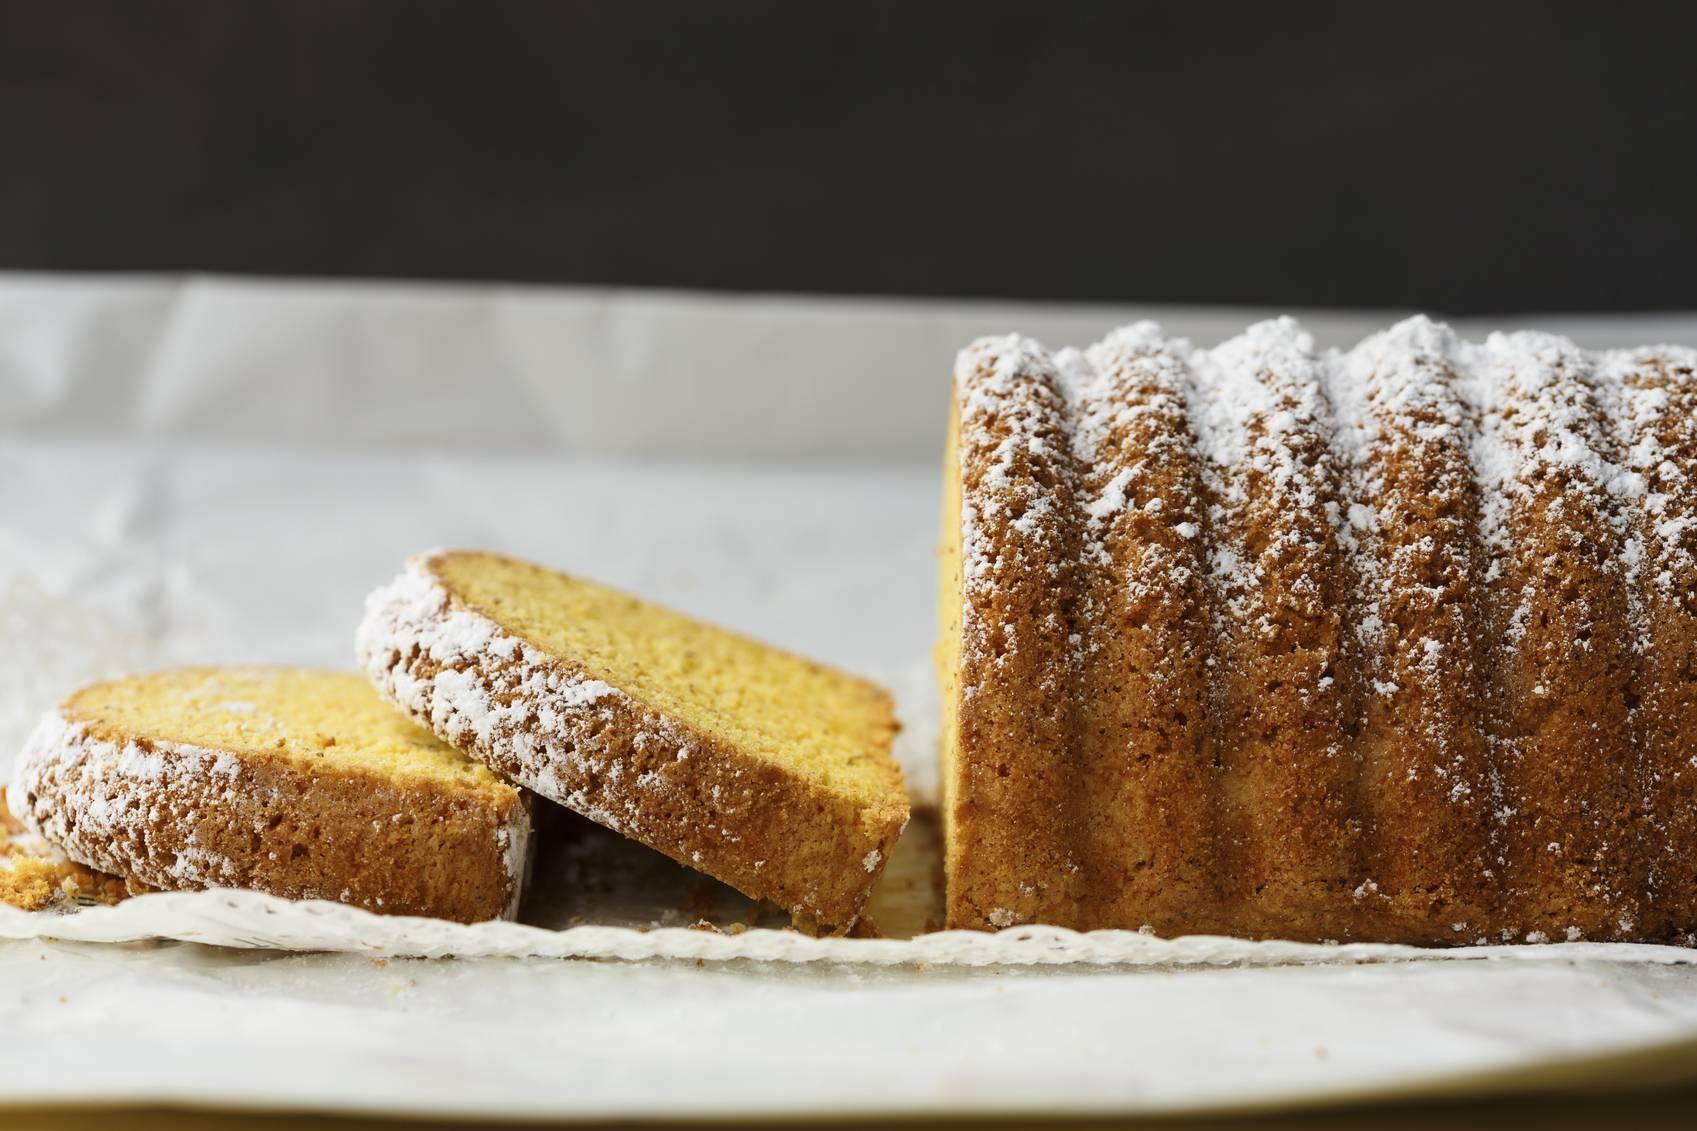 Dolce Varese cake